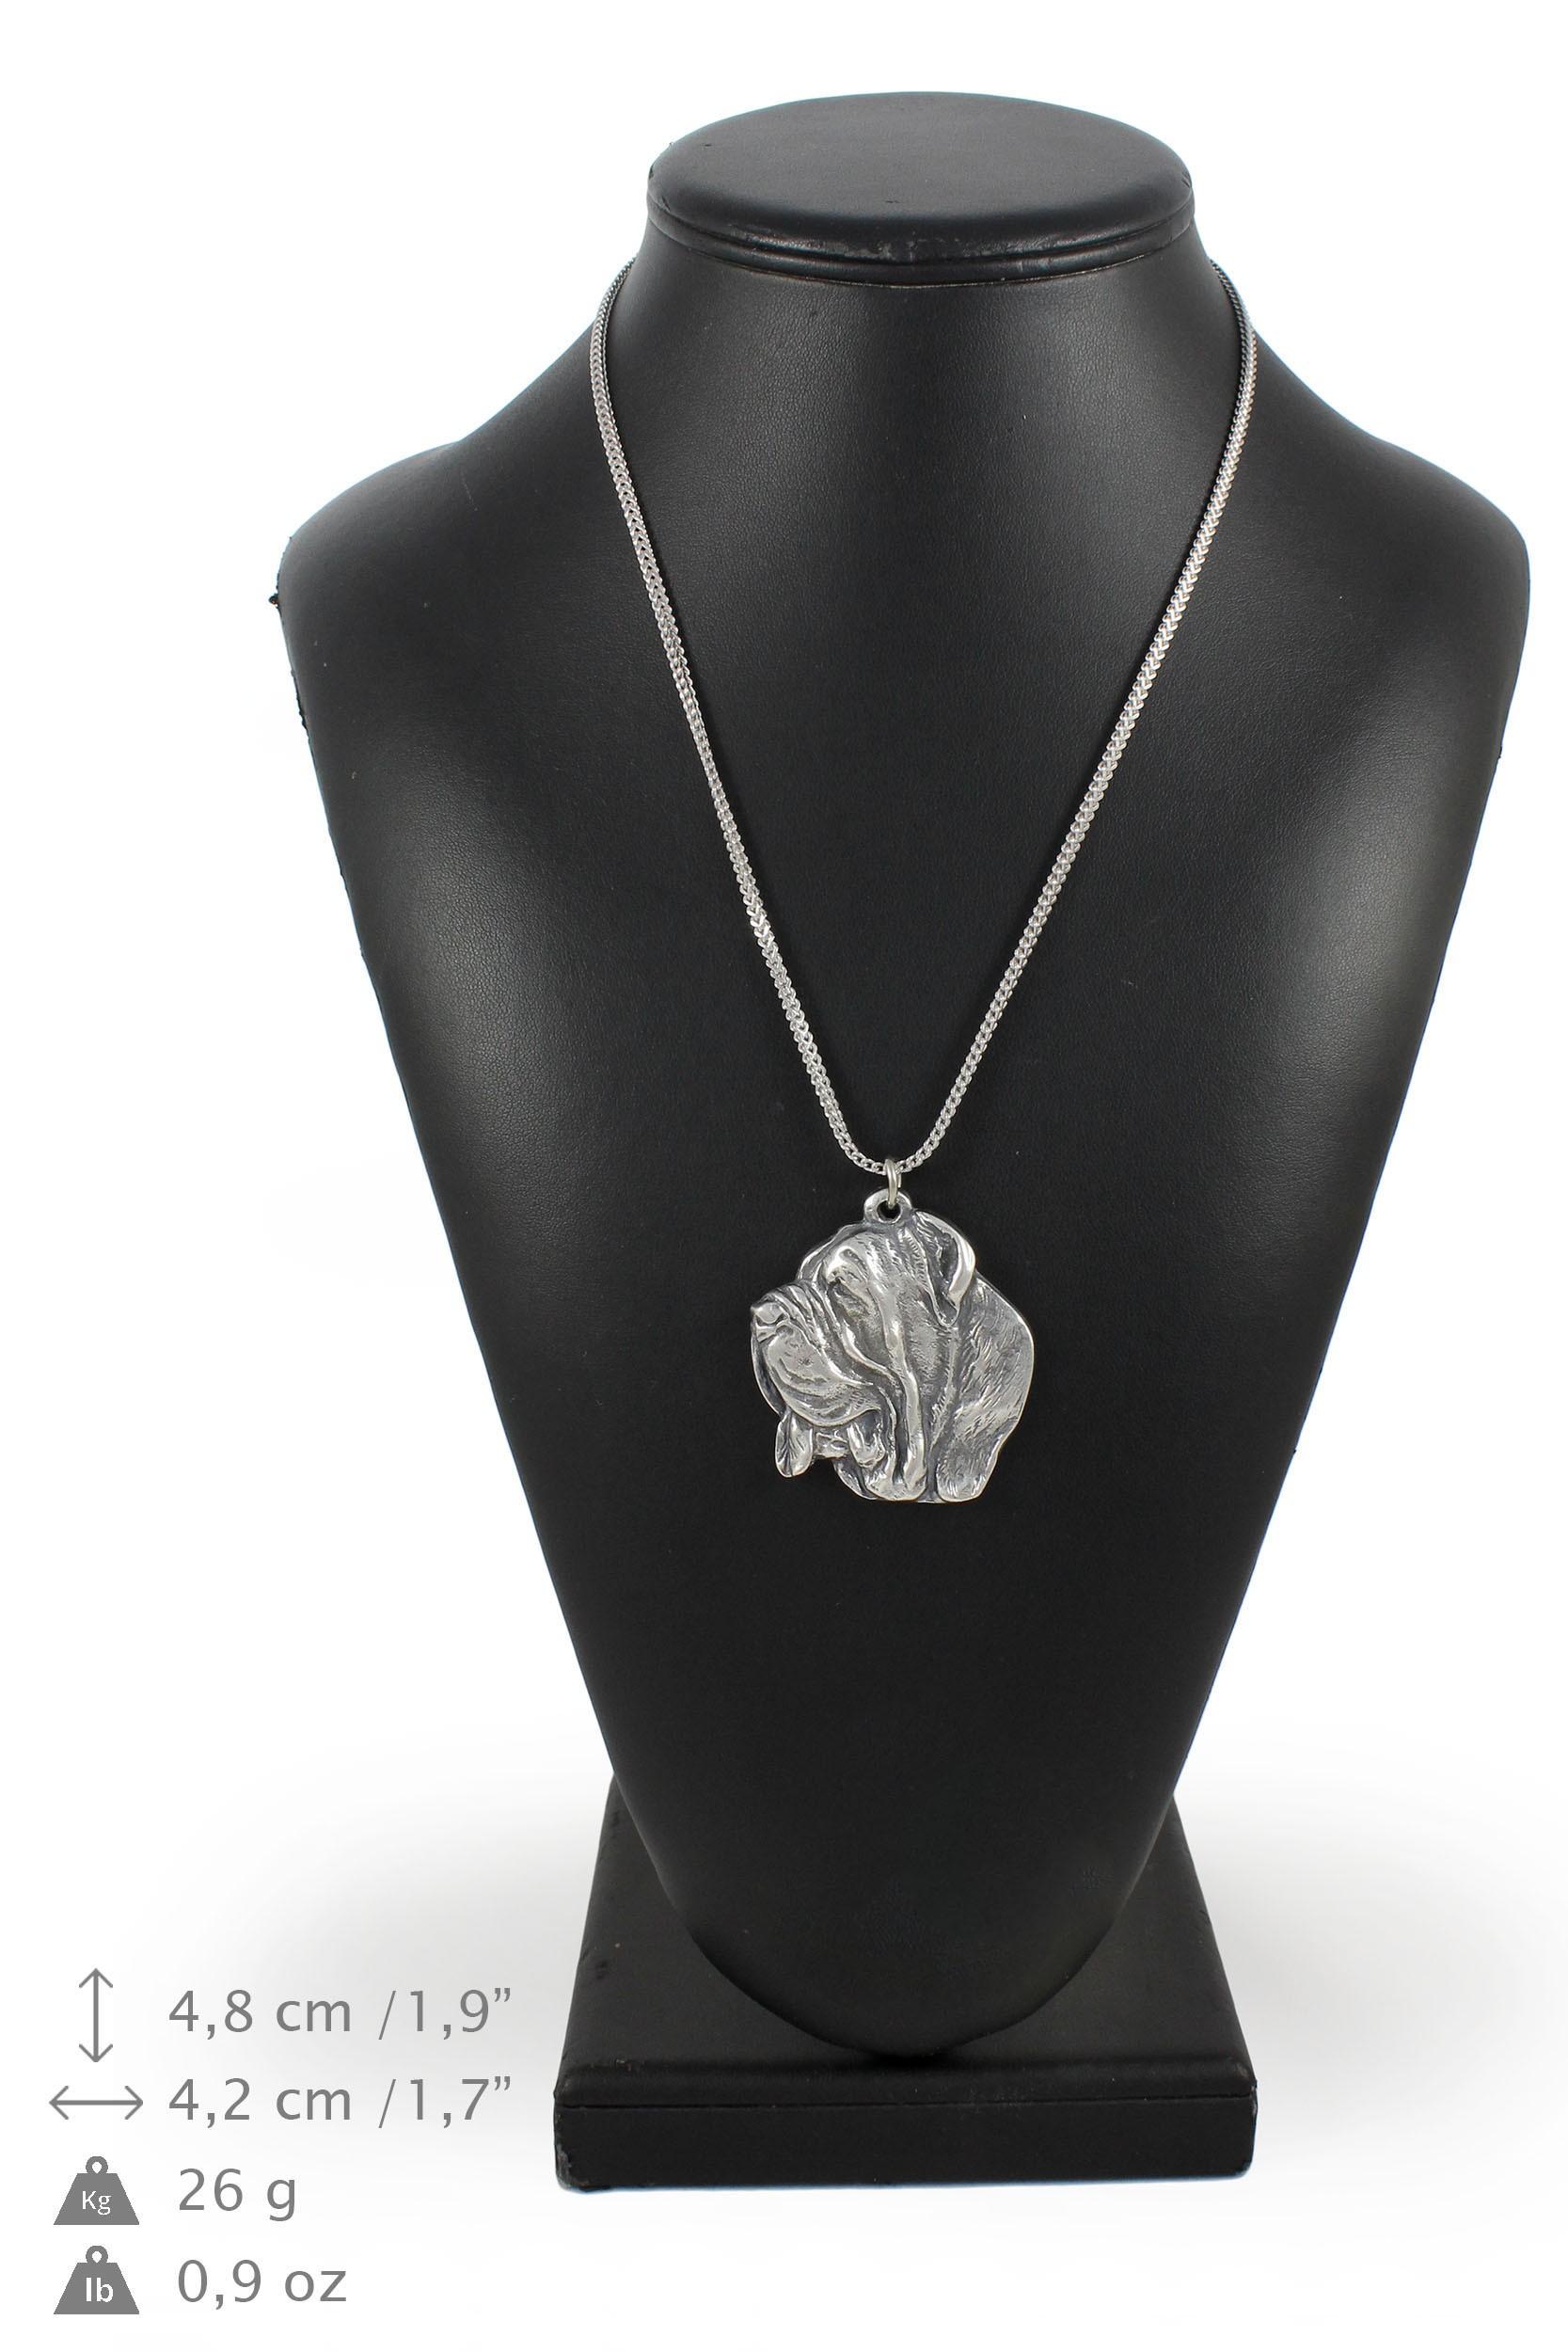 Mâtin napolitain - silver plaqué collier sur une cordon en silver Art Dog FR